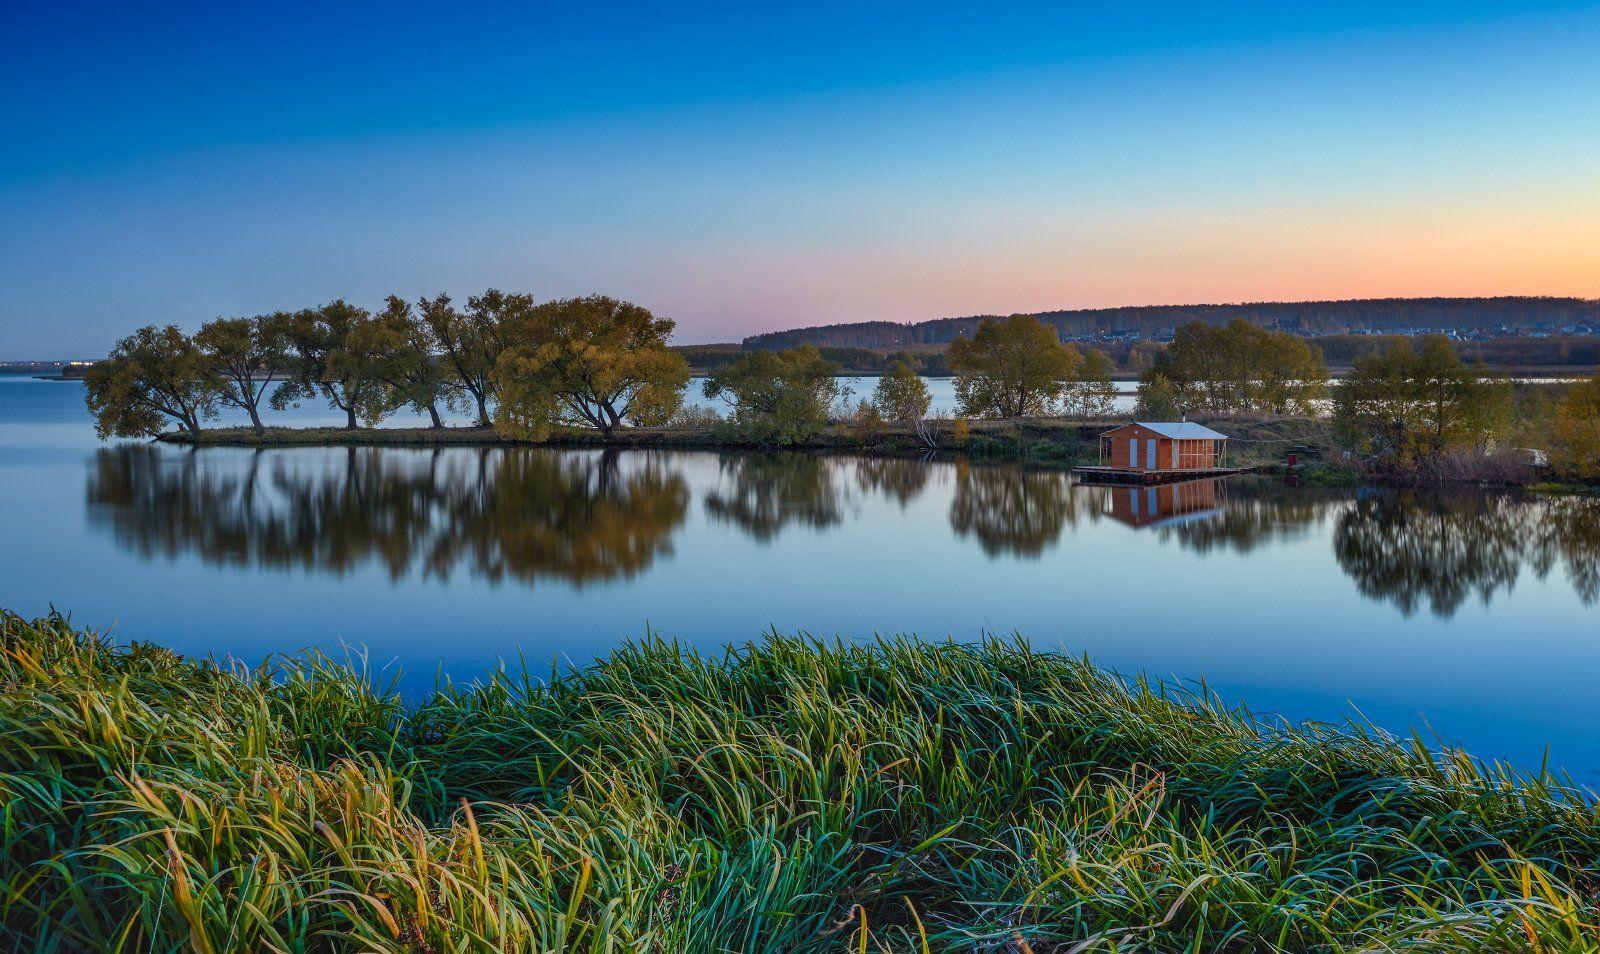 осень октябрь челябинск баня трава закат, Михаил Трахтенберг ( t_berg )